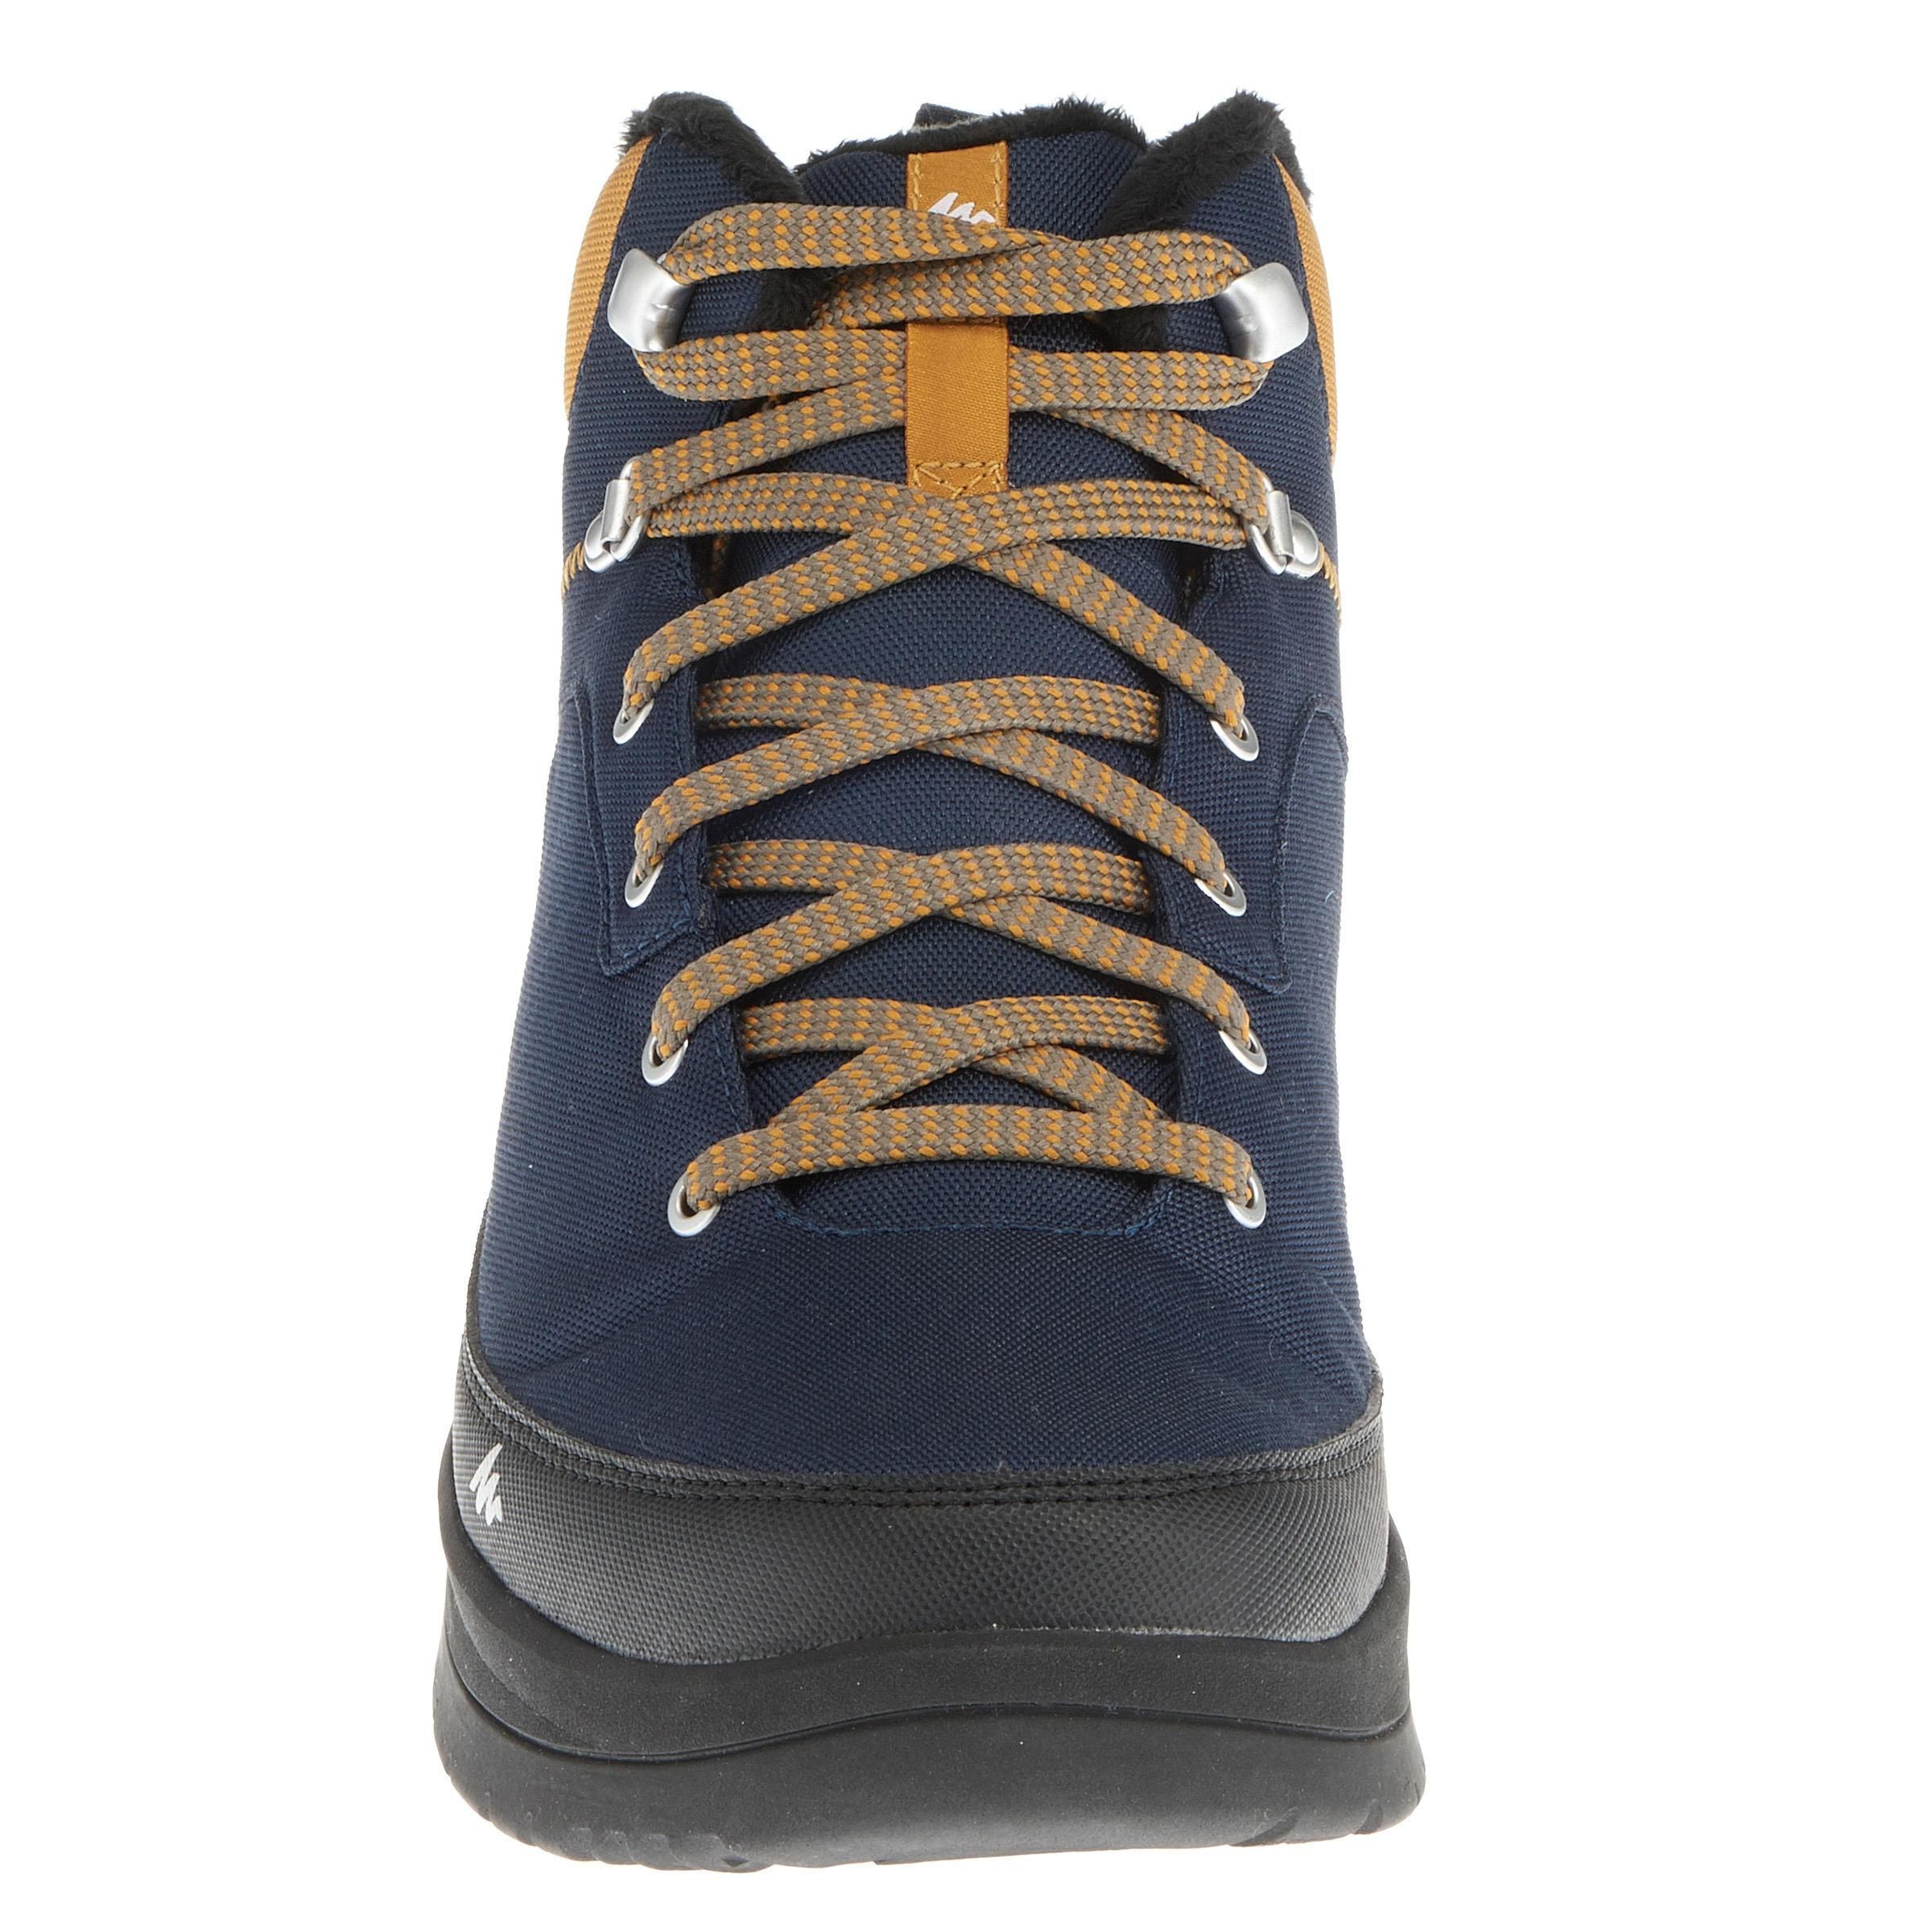 Men's Snow Hiking Shoe SH100 WARM Mid - Blue